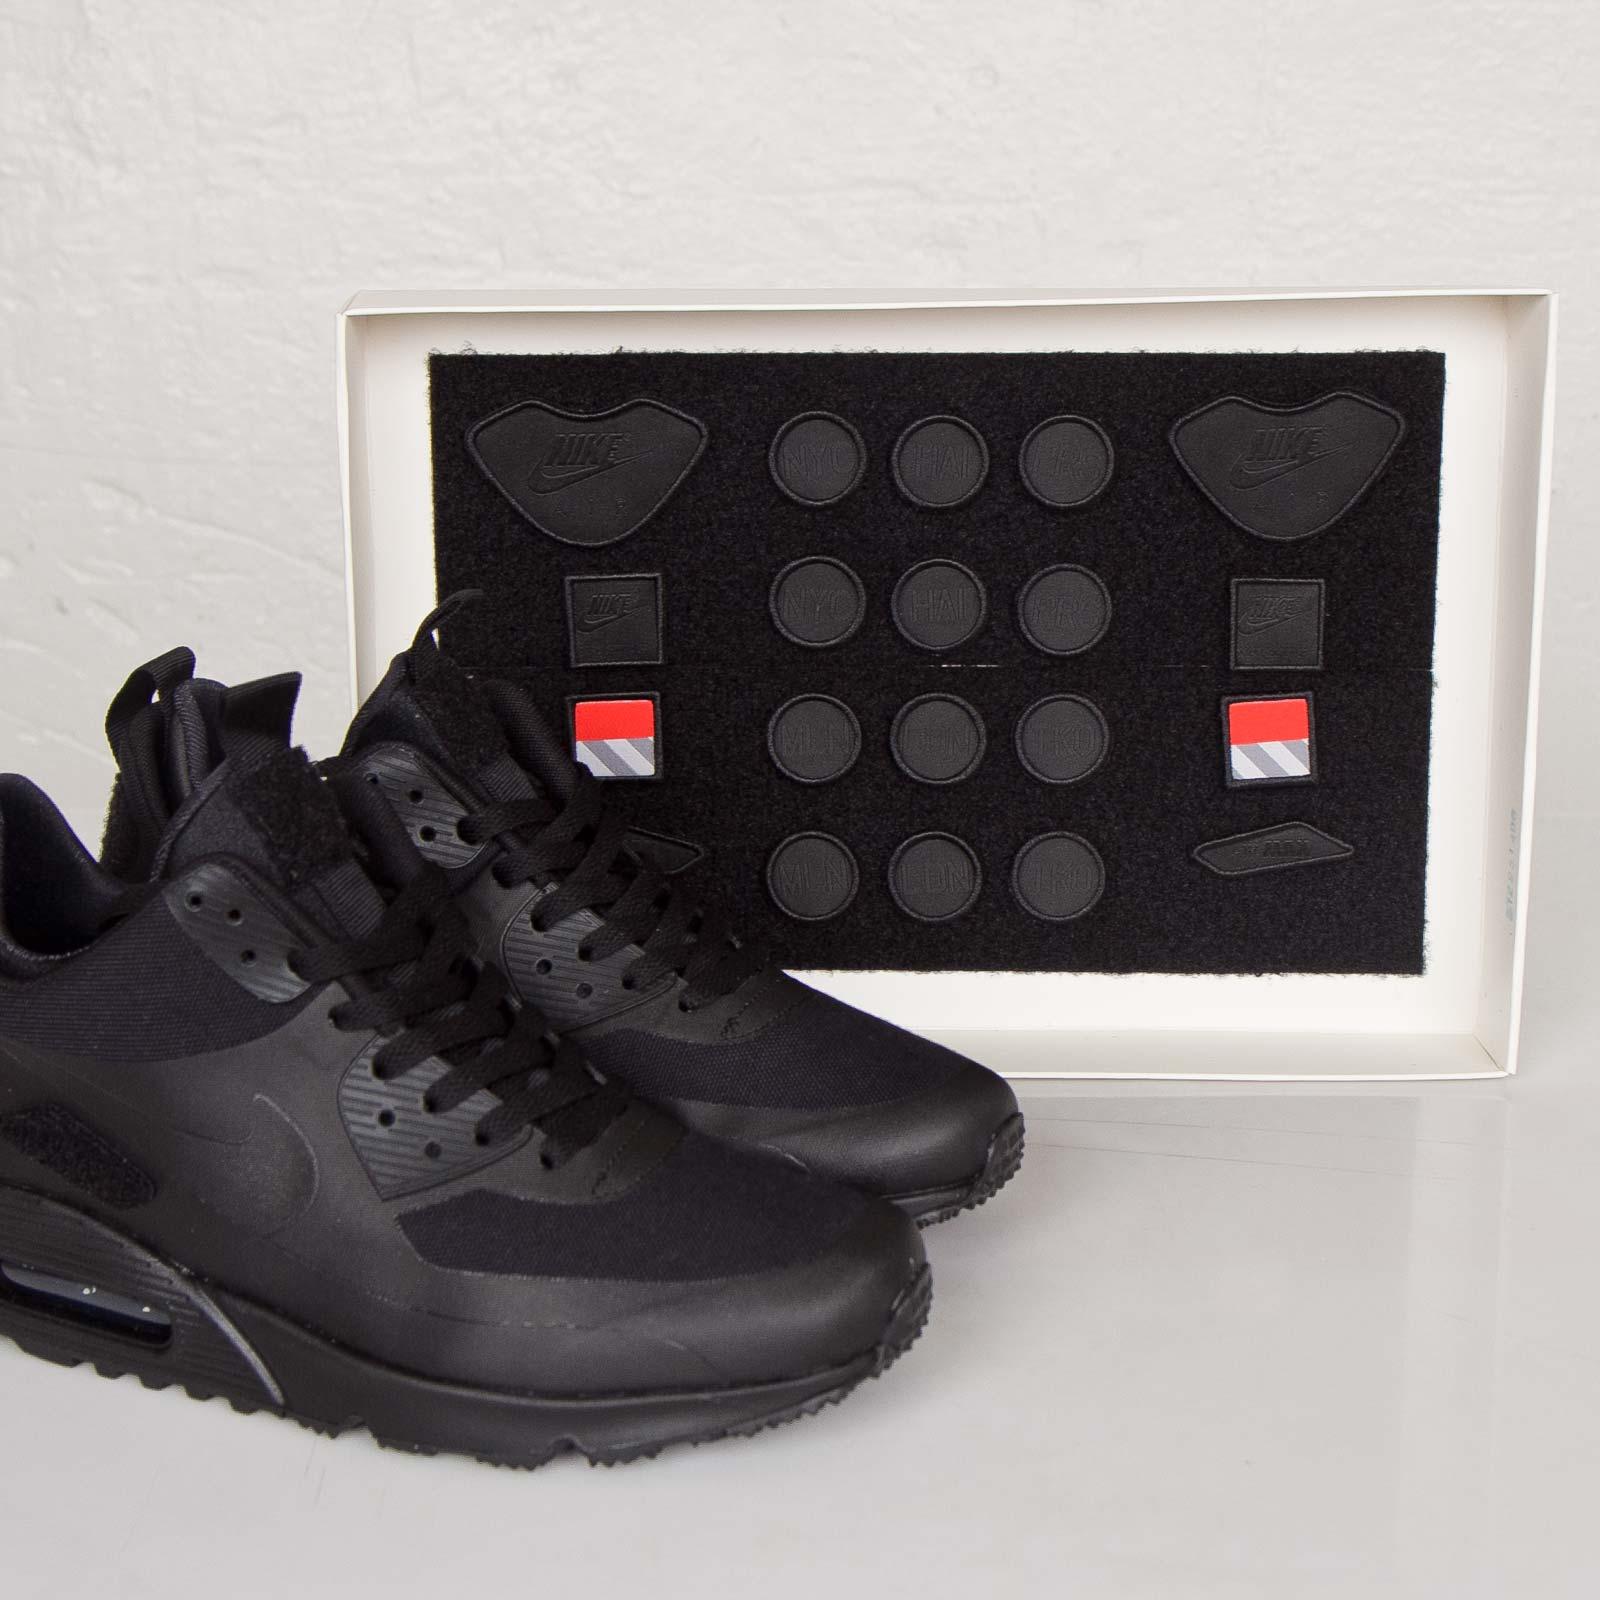 Nike Air Max 90 Sneakerboot SP - 704570